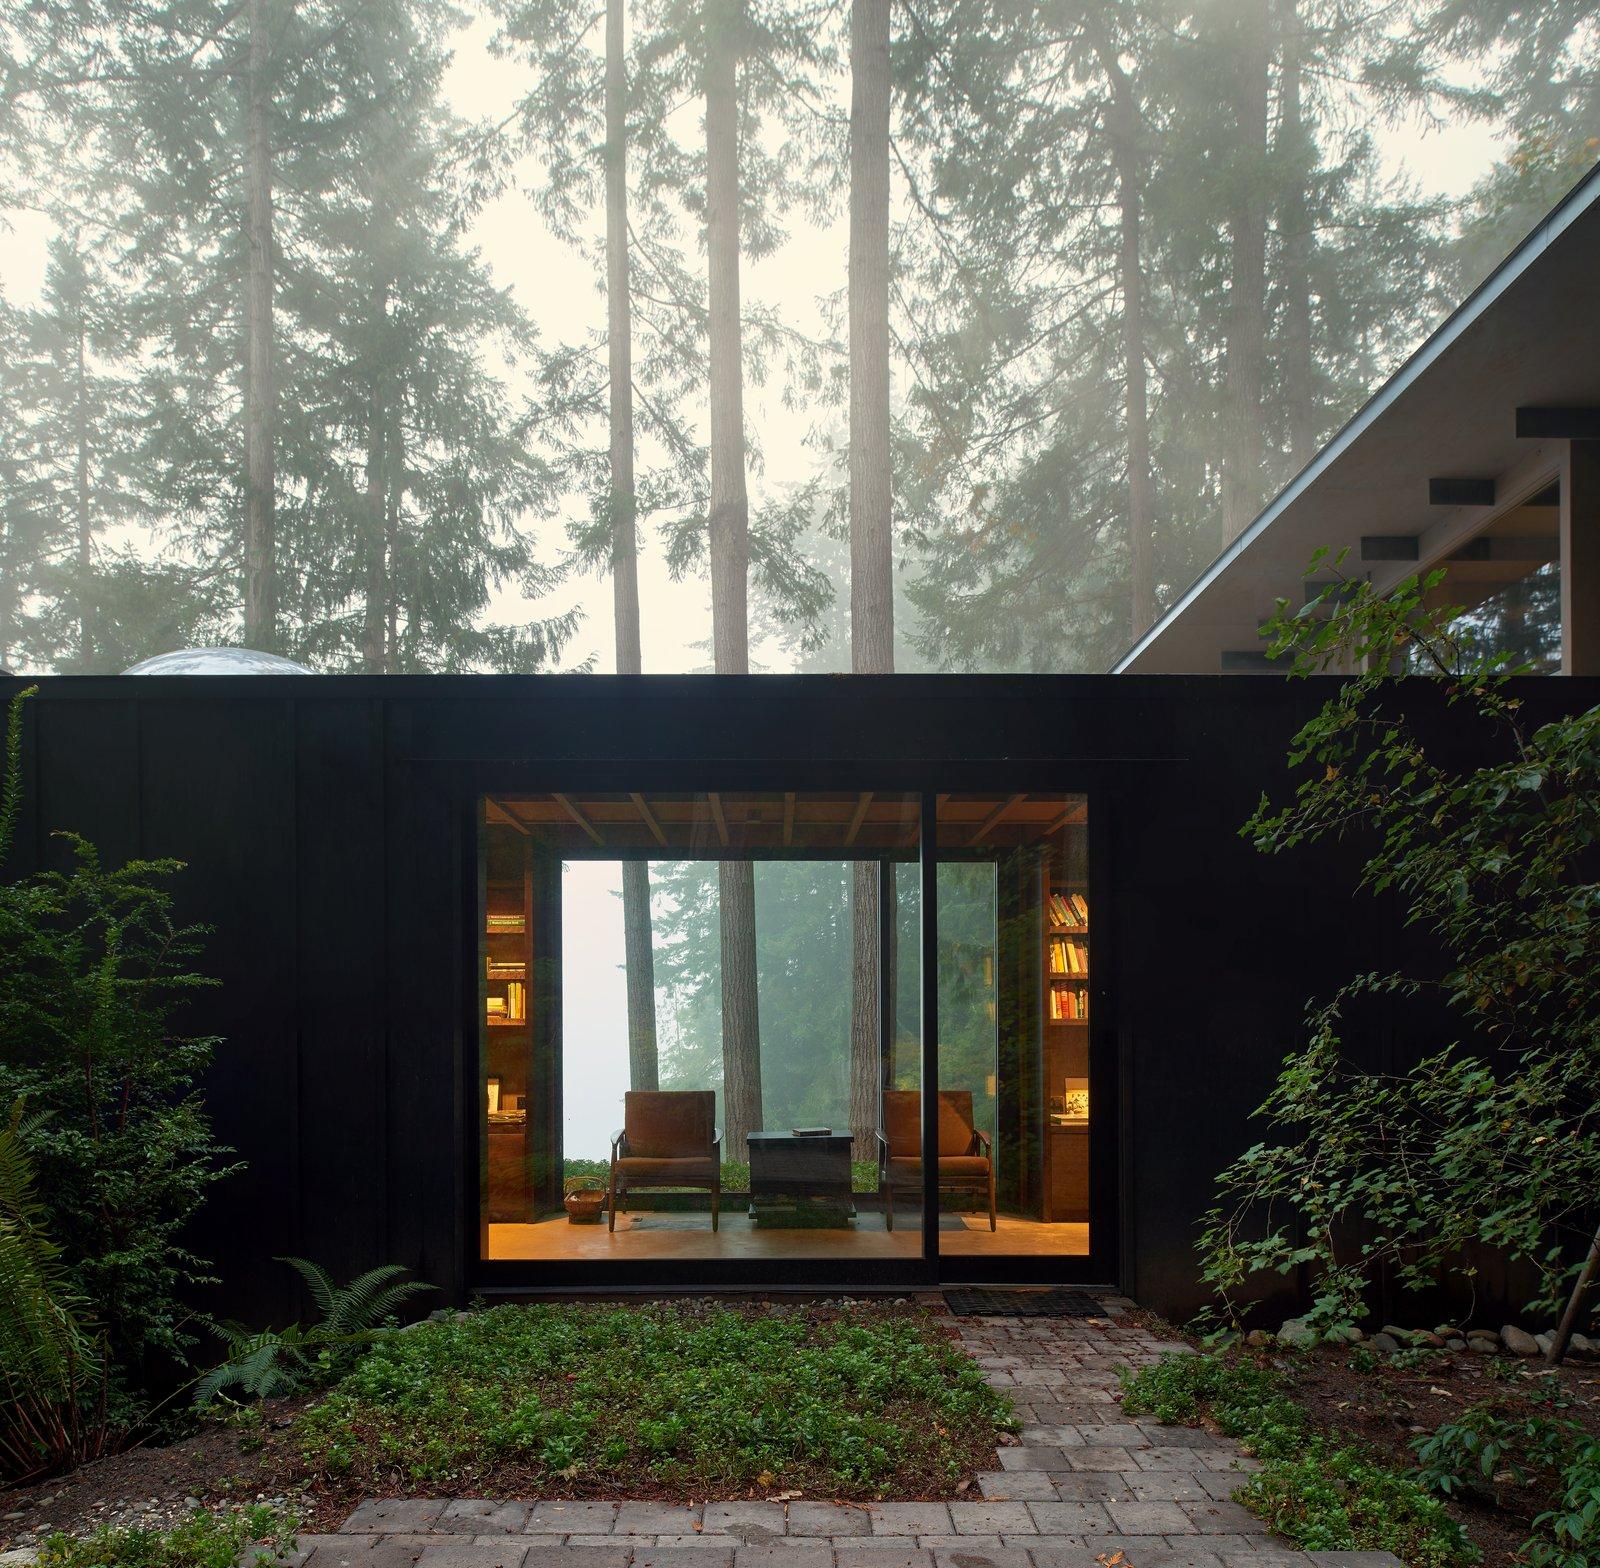 Cabin at Longbranch | Olson Kundig Tagged: Outdoor, Back Yard, Woodland, Walkways, and Shrubs.  Cabin in Longbranch by Olson Kundig